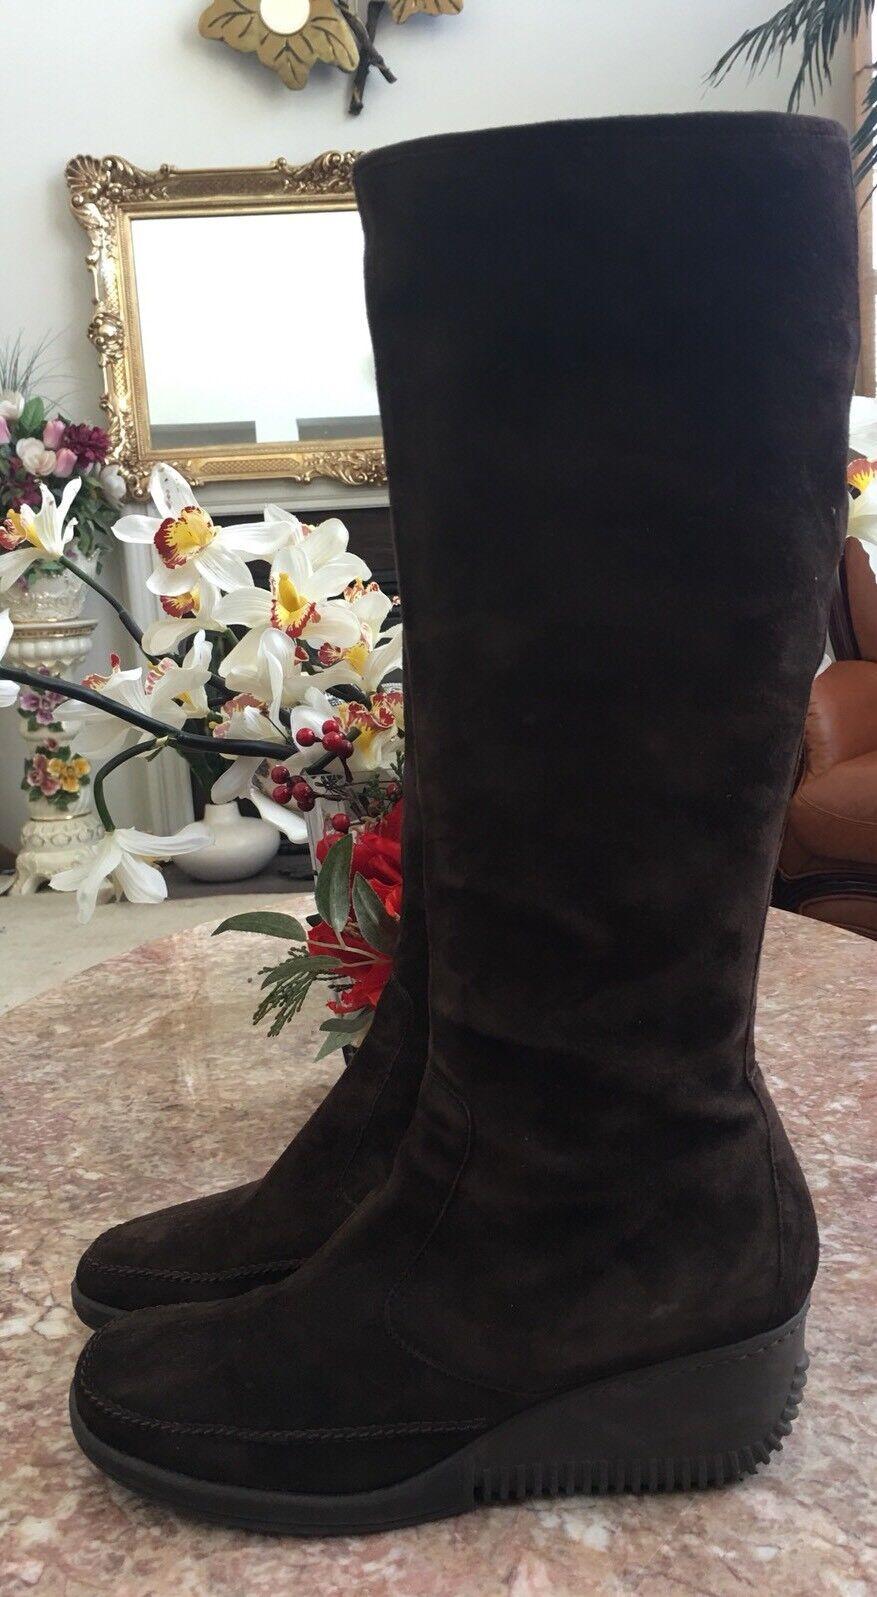 Via Größe Spiga Mid Calf Braun Suede Zip Größe Via 9.5 Stiefel Made in  EUC,Retail 398 e35b7f